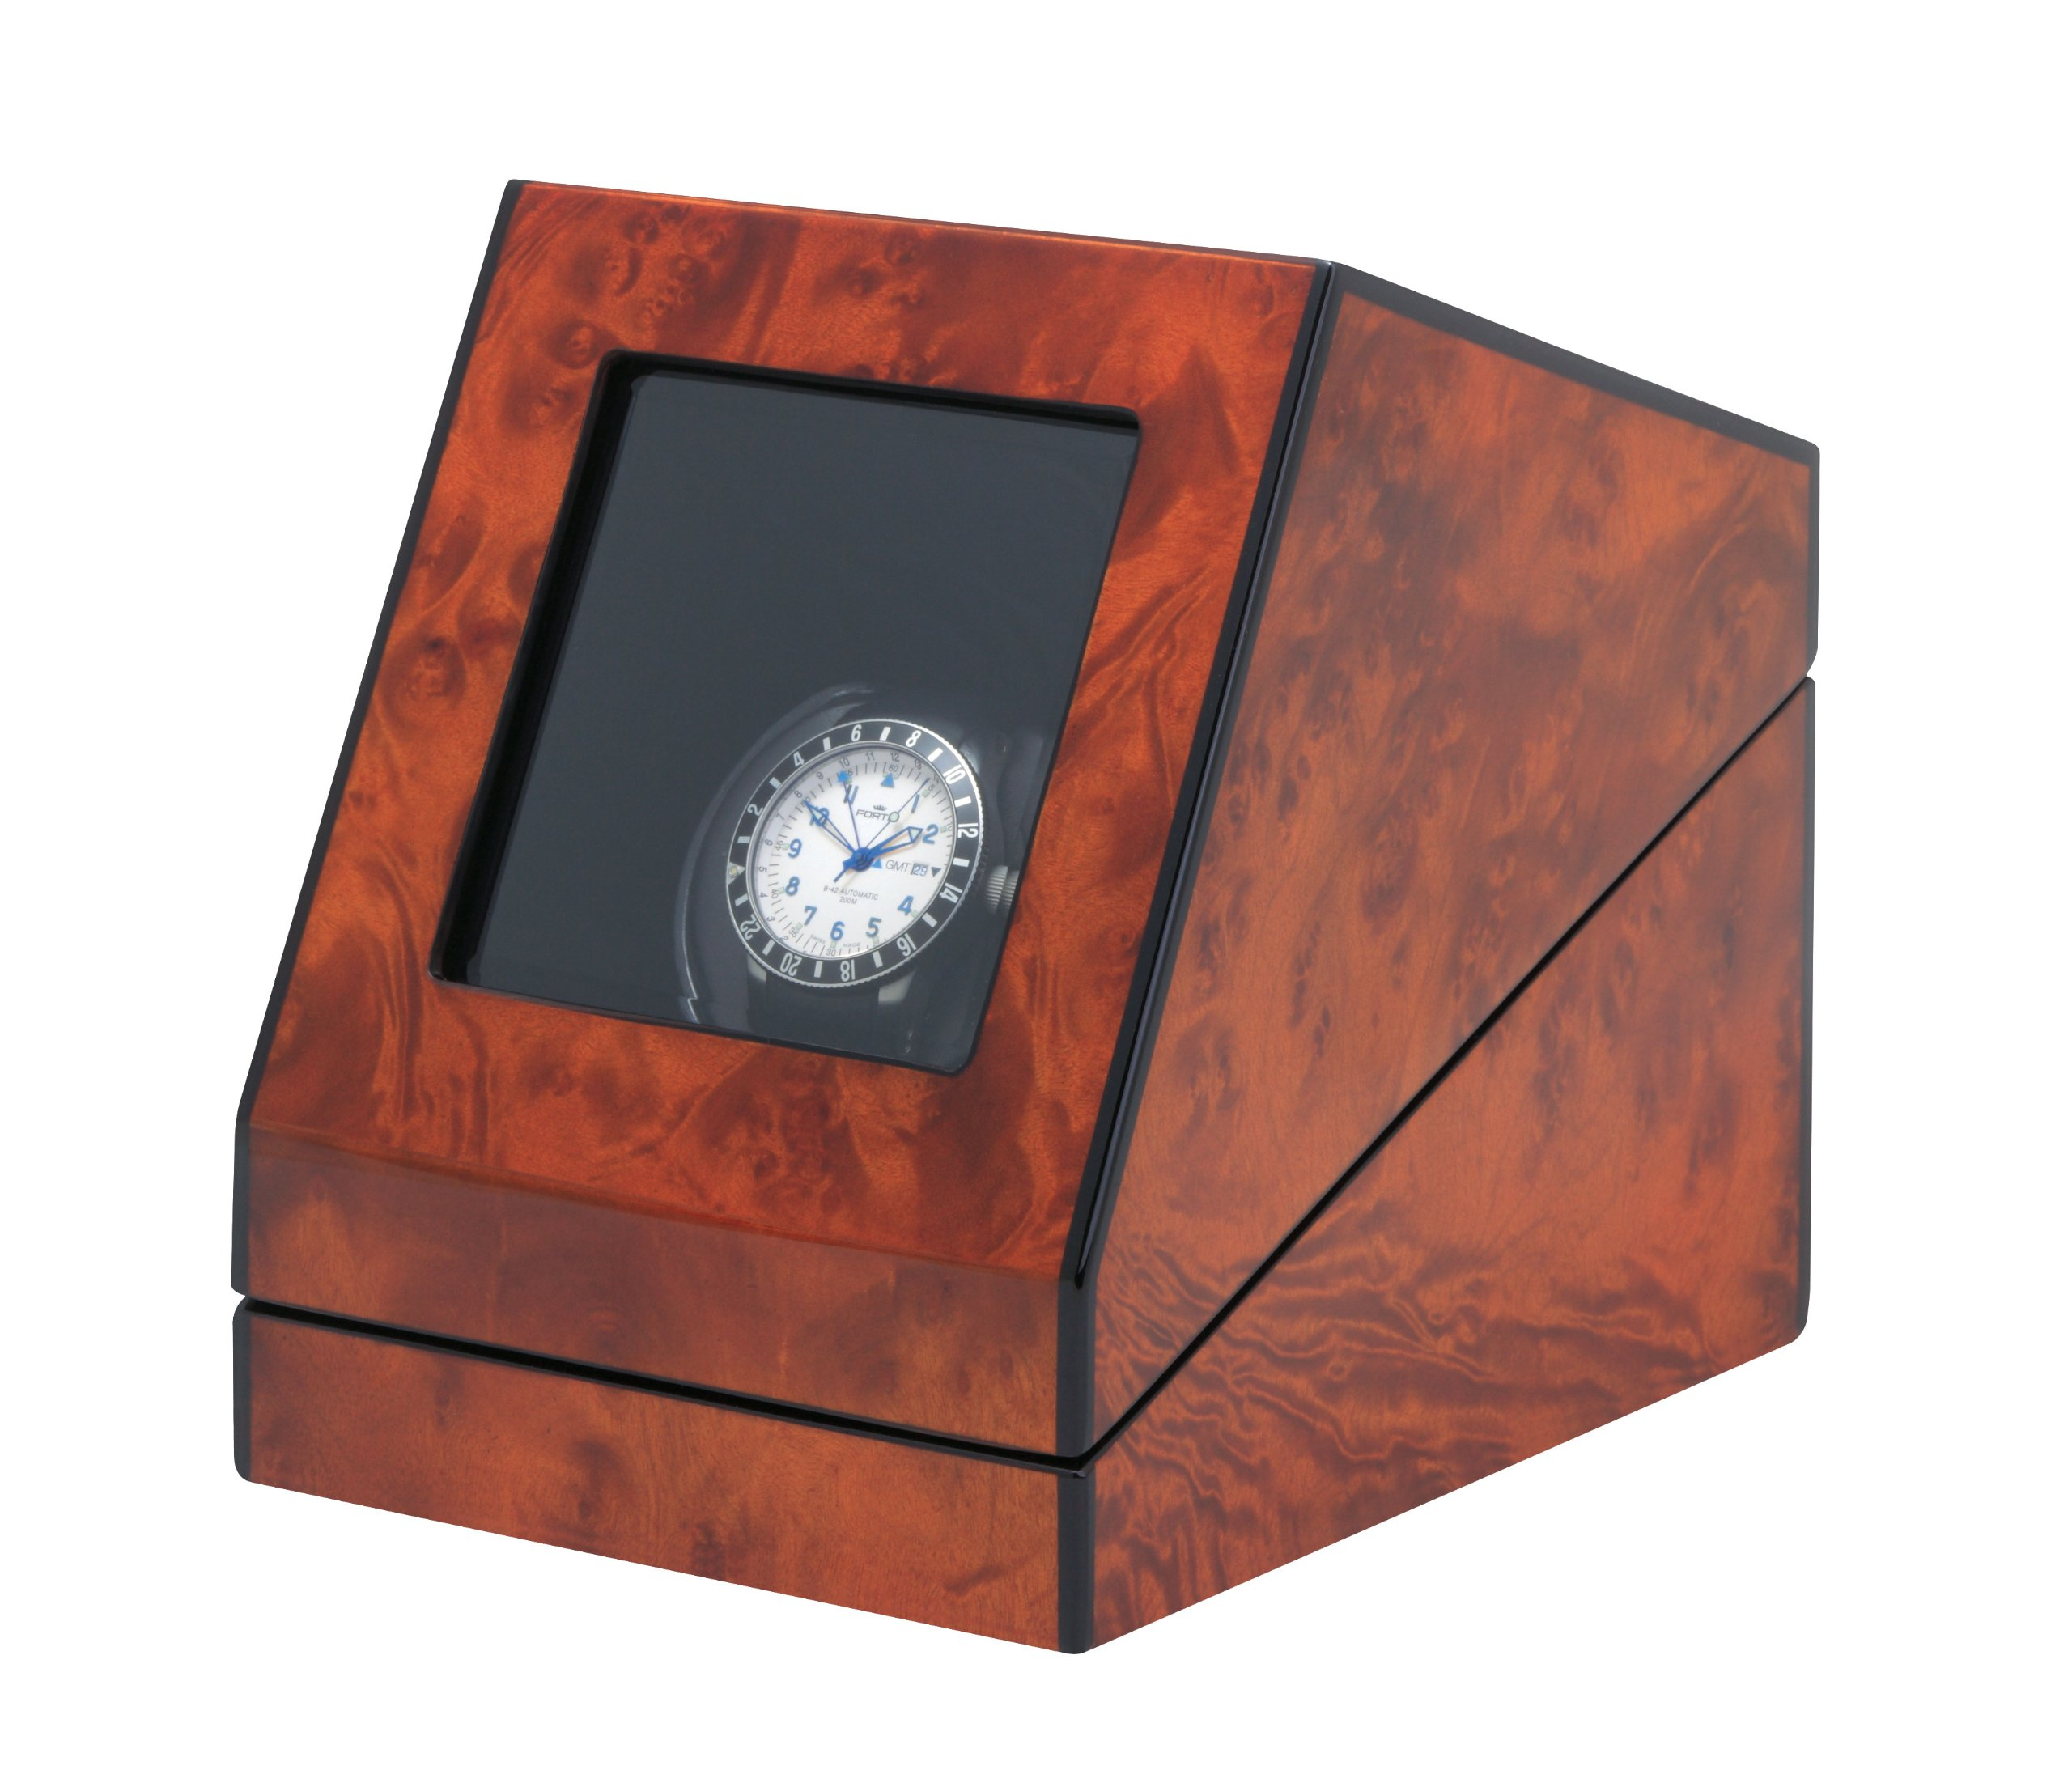 Siena One Programmable Watchwinder in Burl by Orbita by Orbita